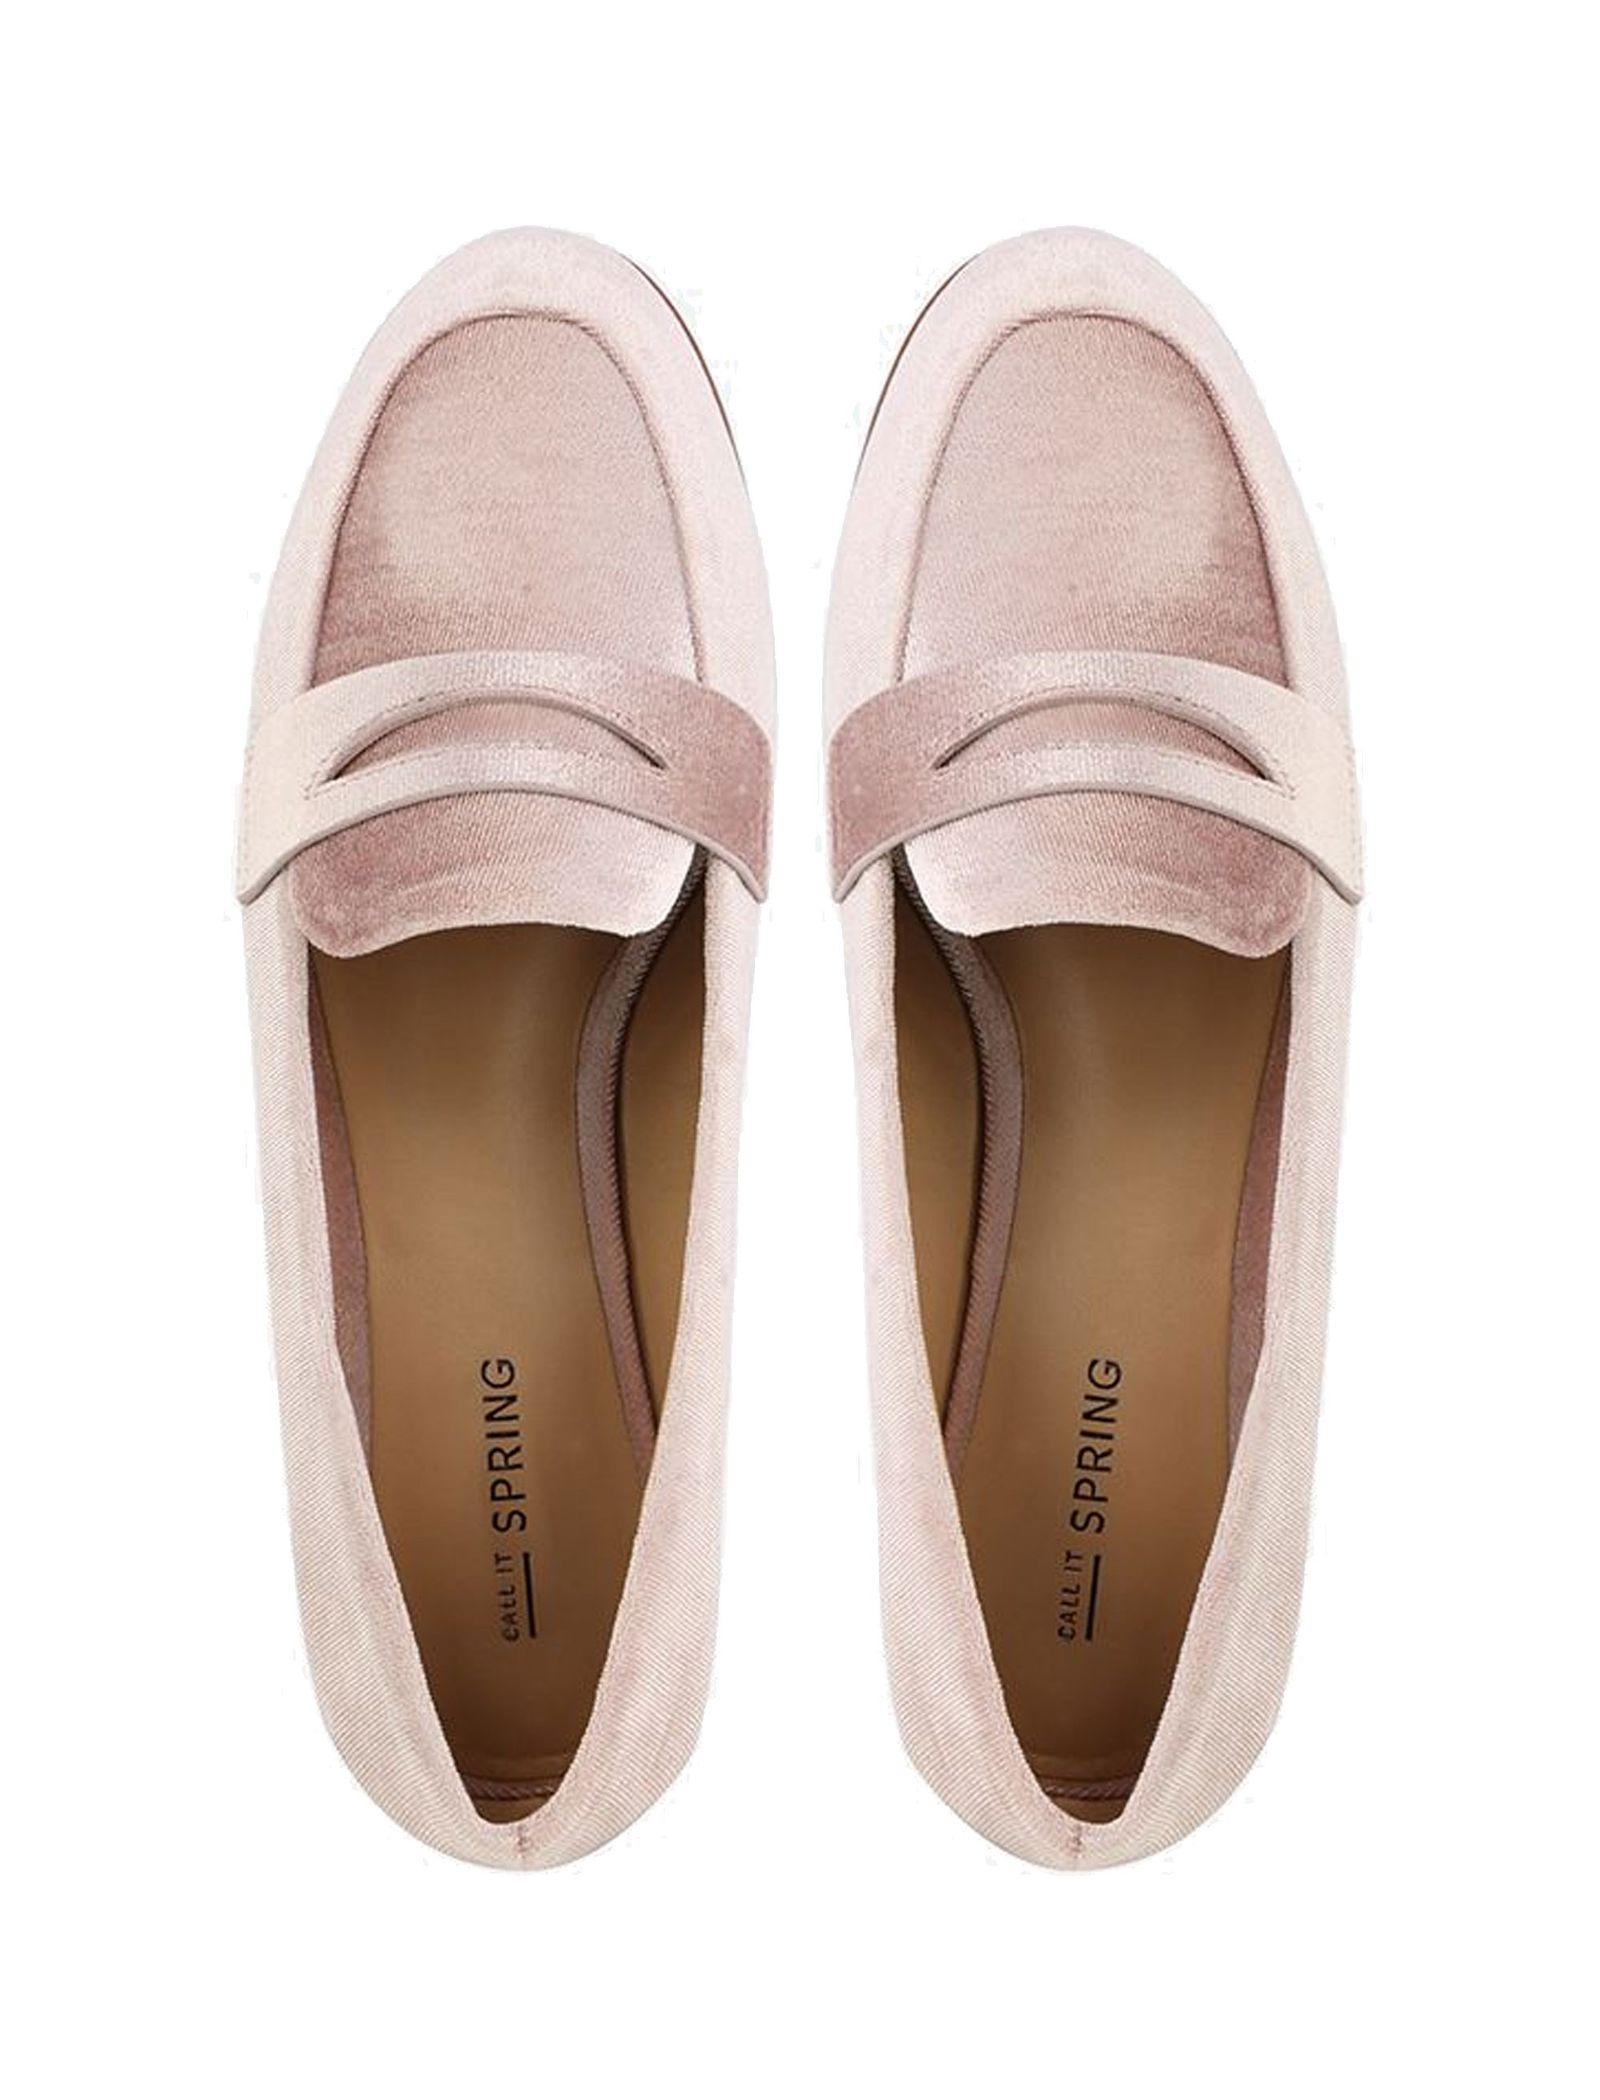 کفش تخت زنانه - کال ایت اسپرینگ - صورتي روشن - 2